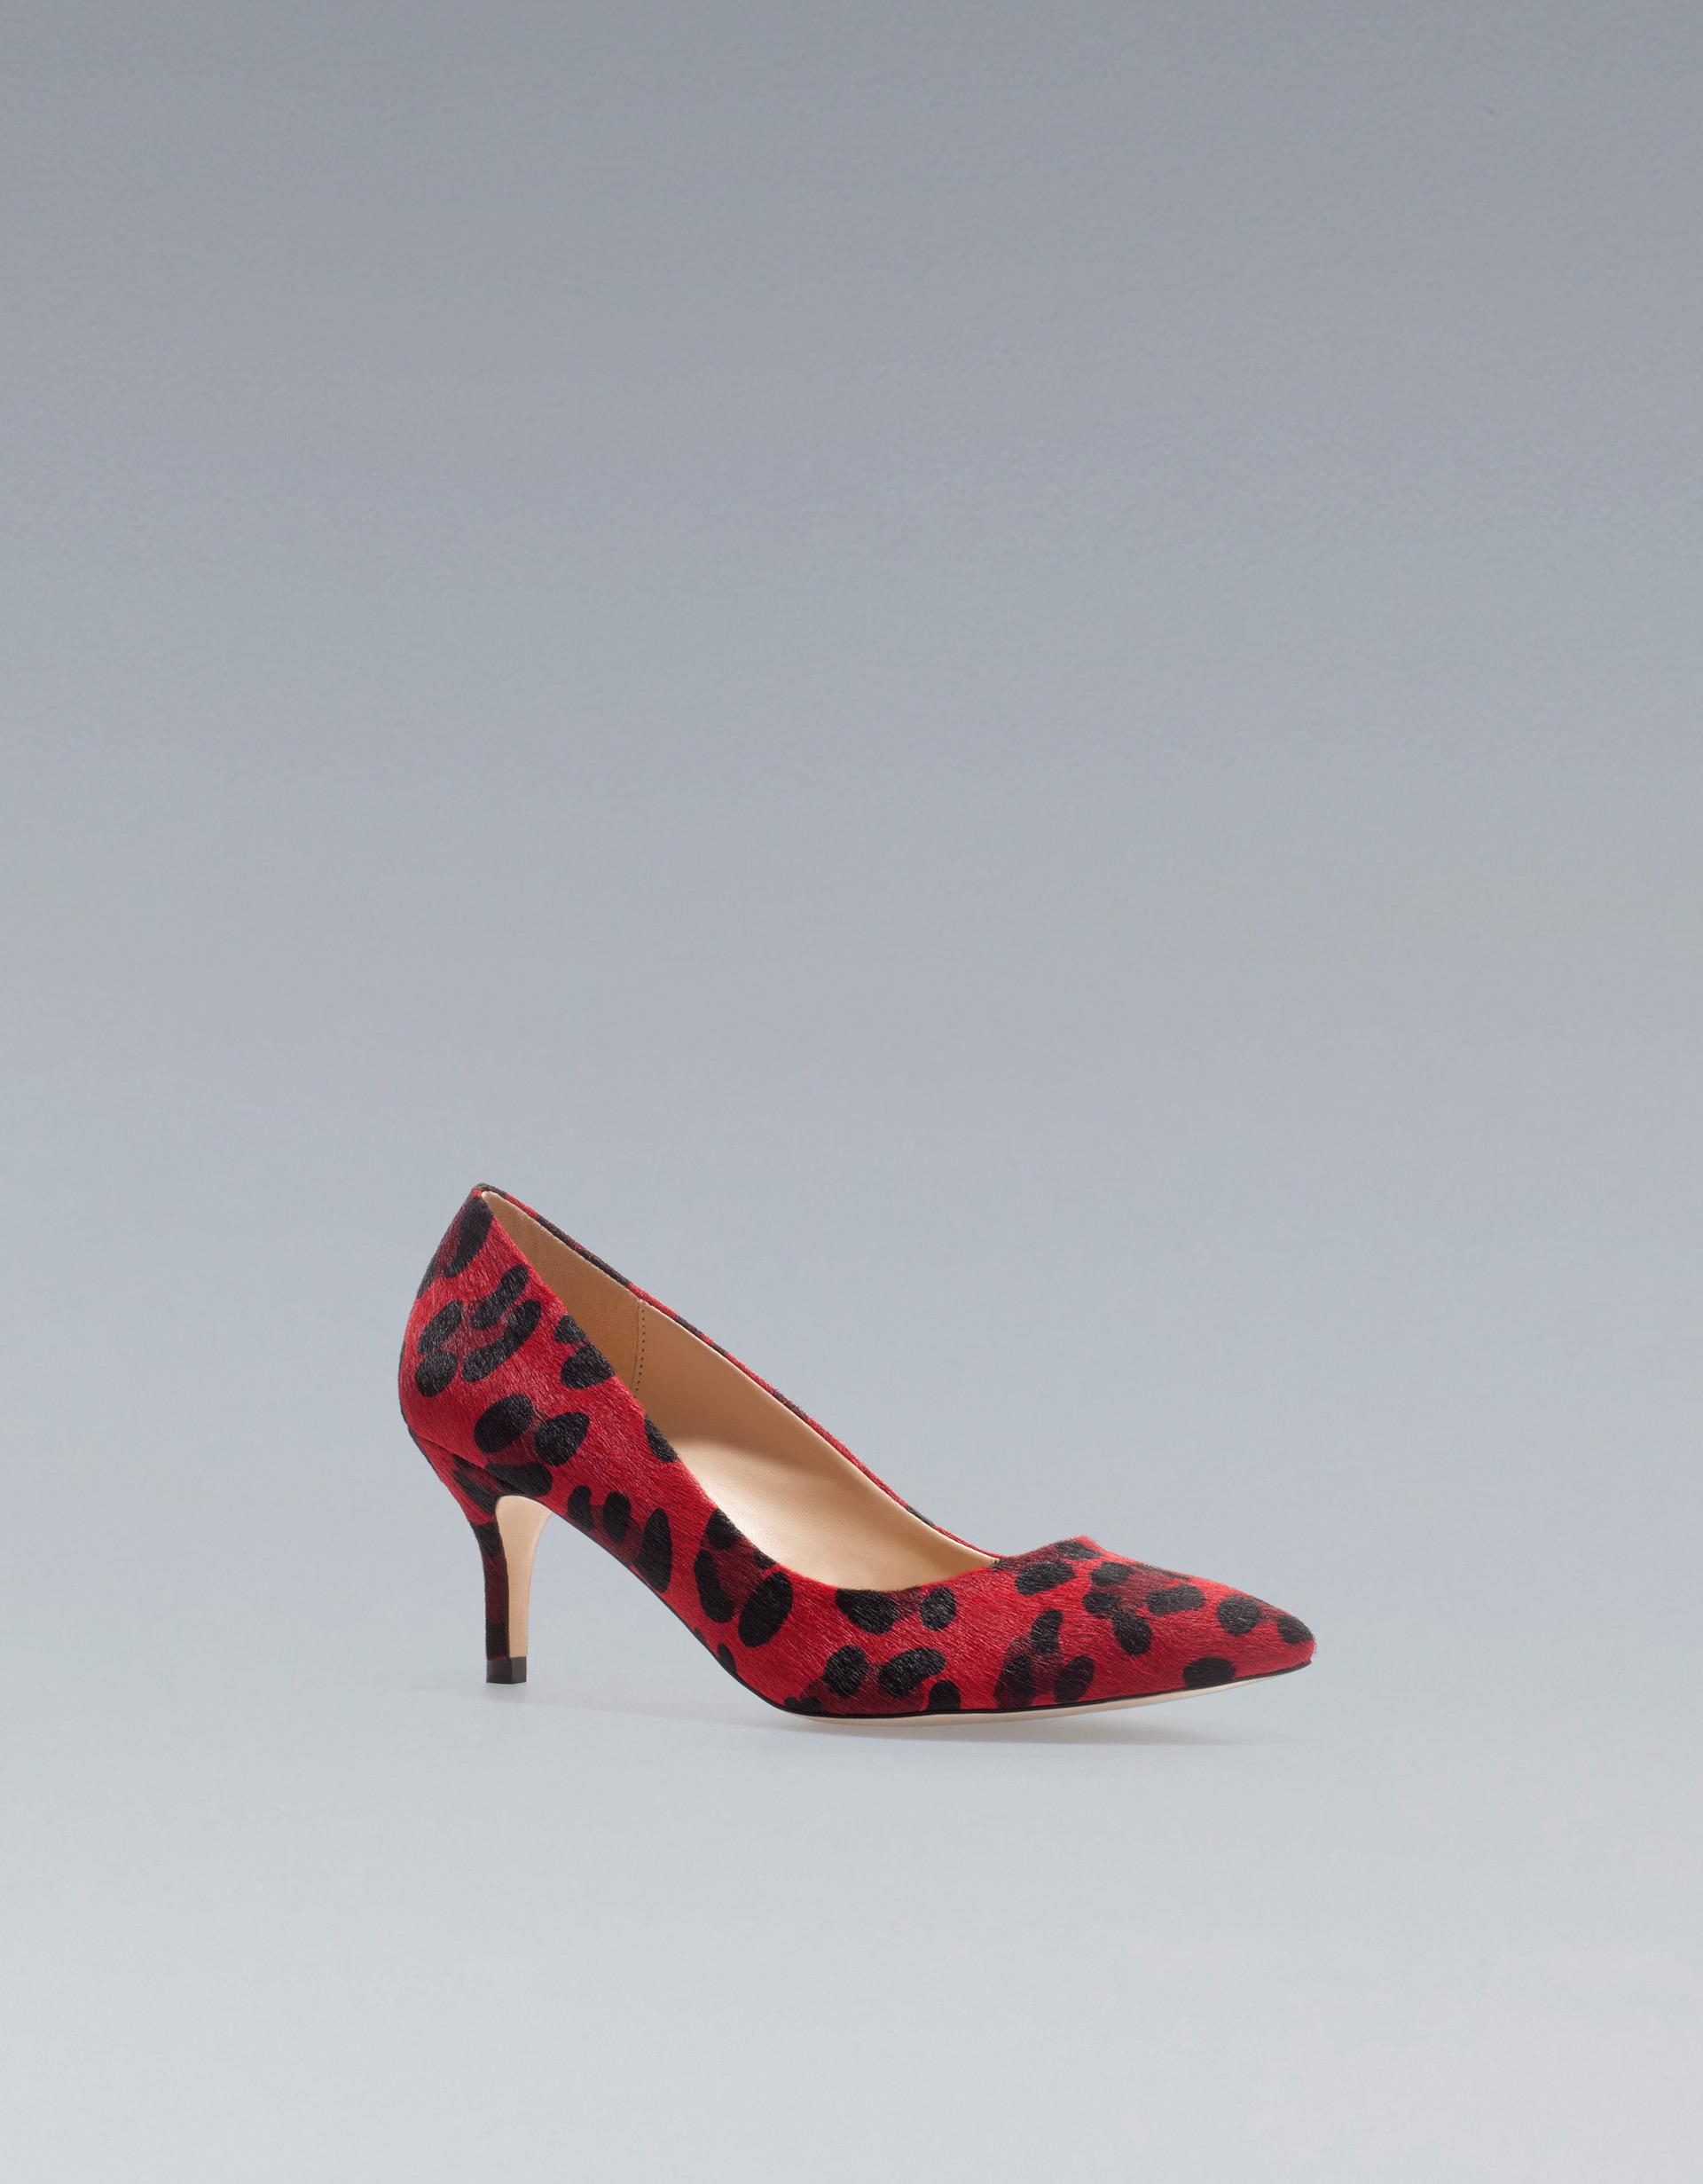 Leather Kitten Heel Shoes